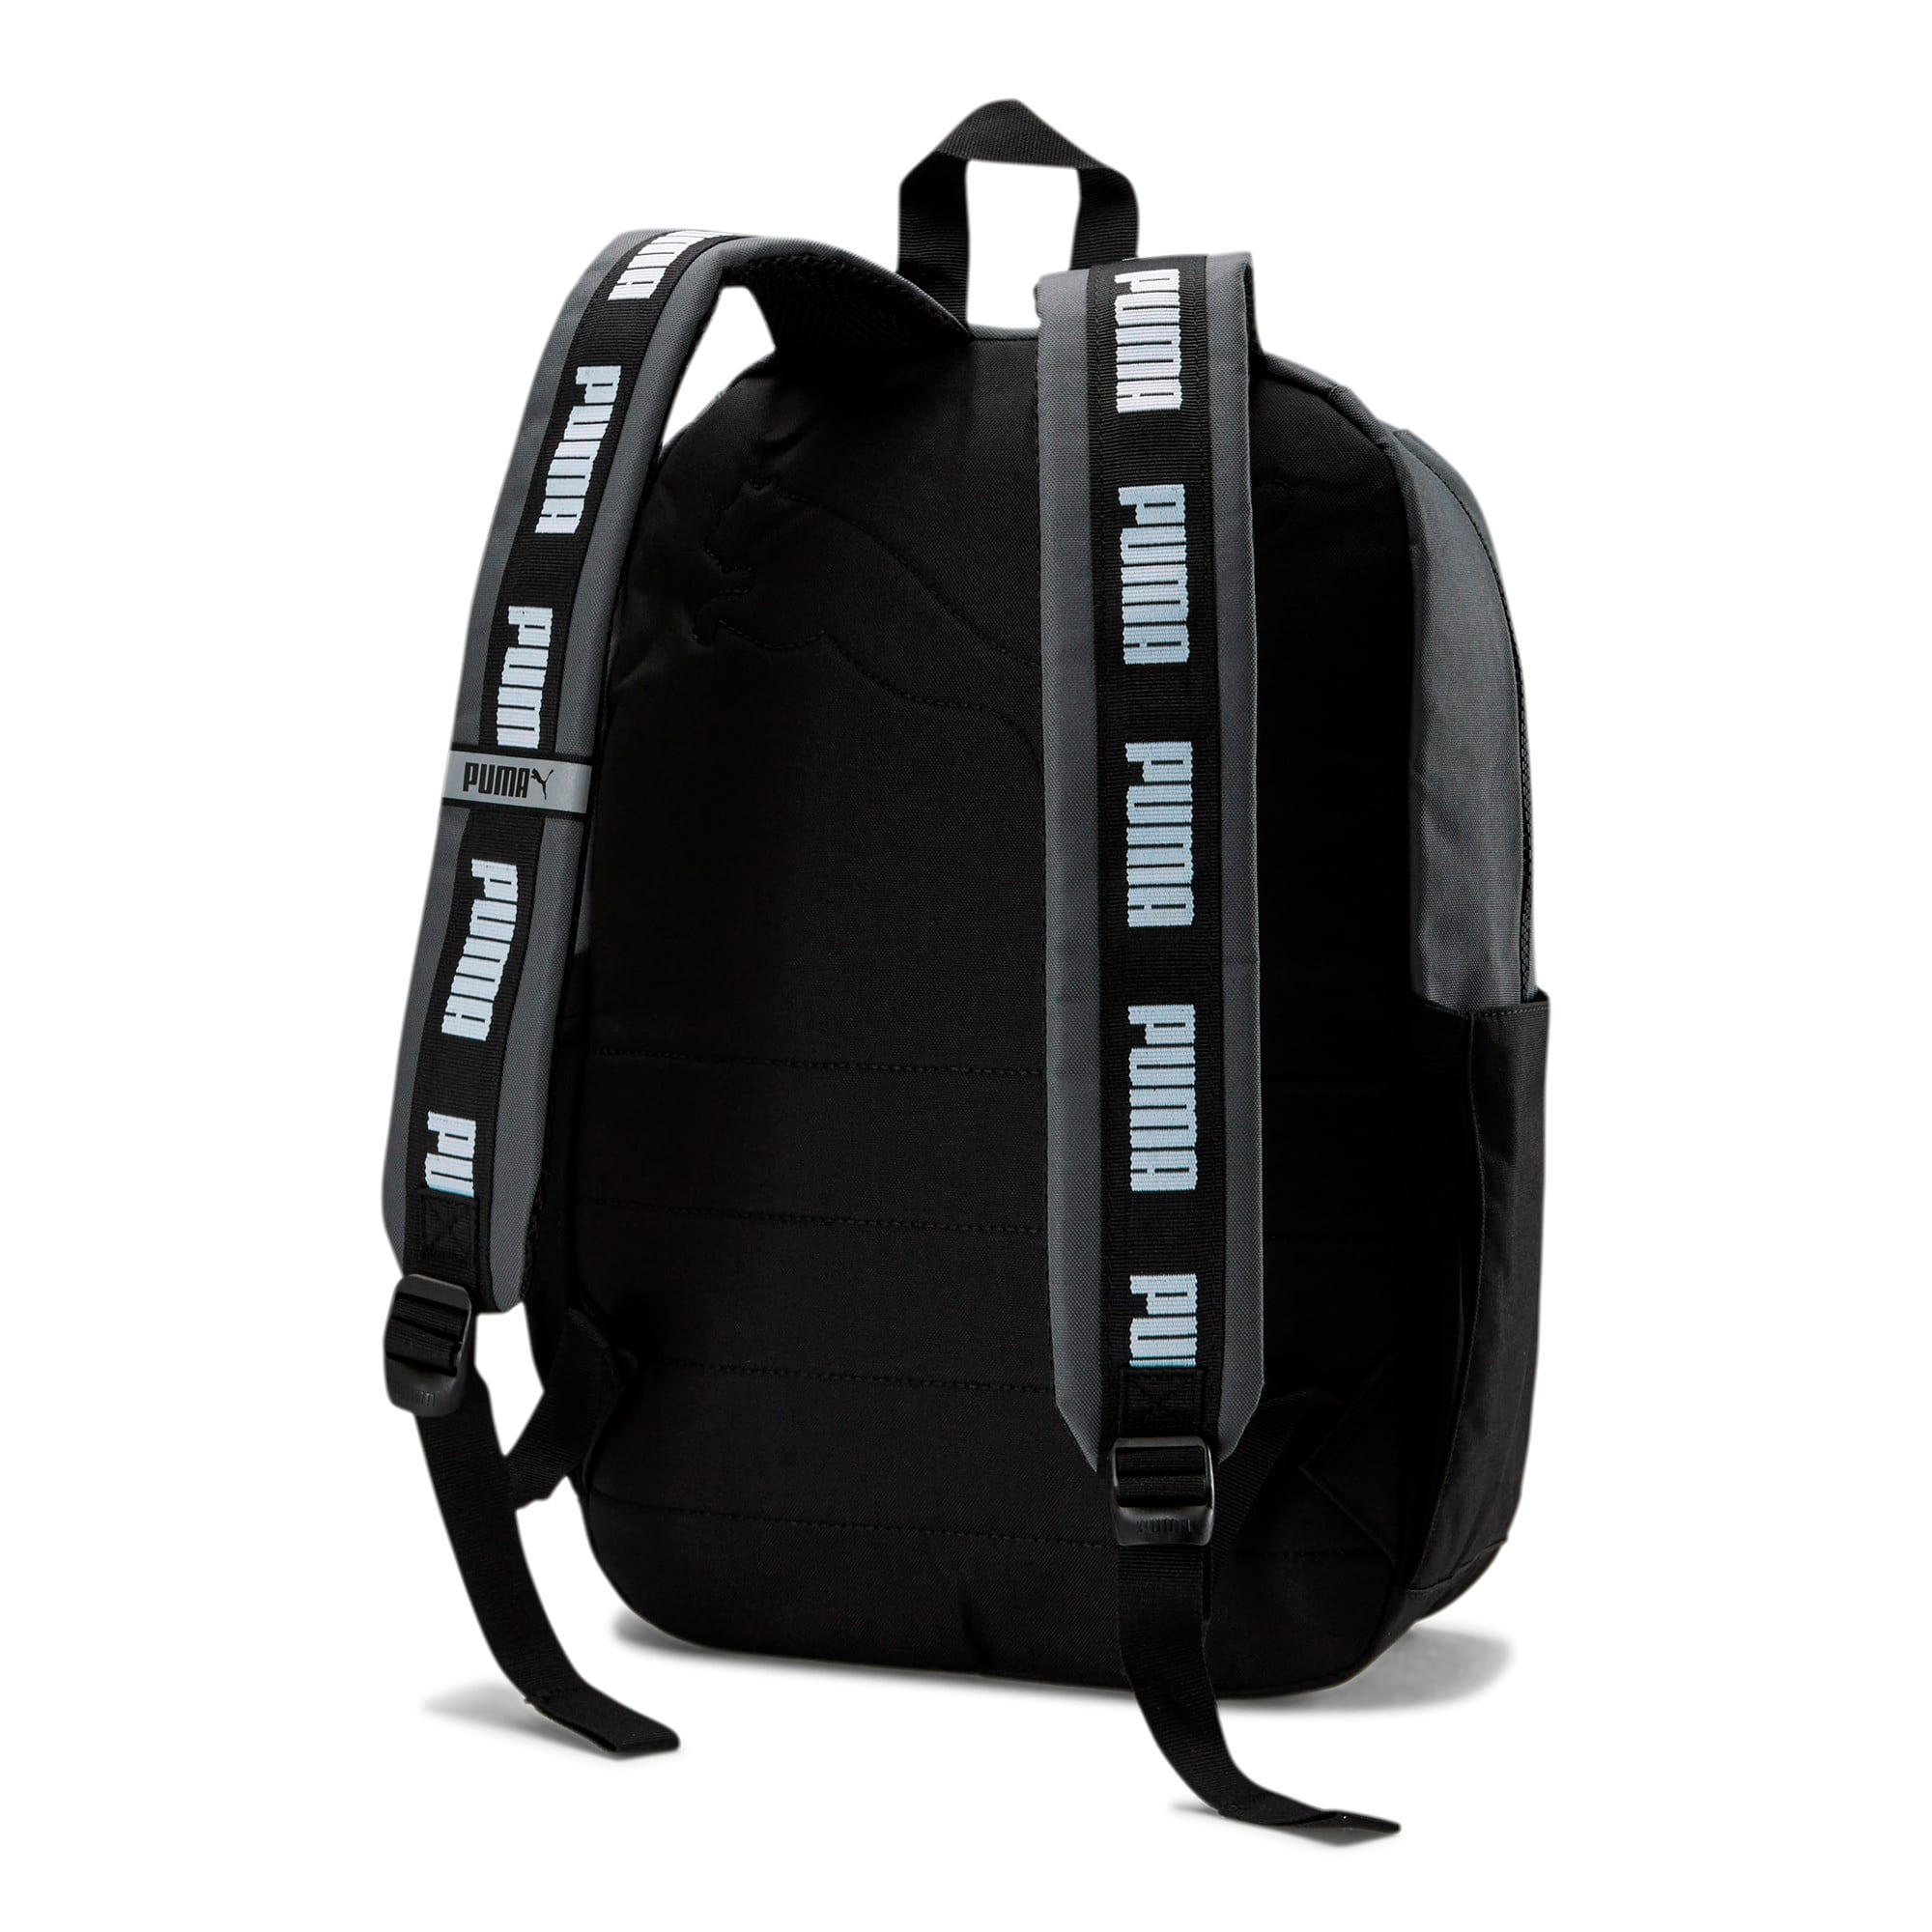 Thumbnail 2 of Streak Backpack, Dark Grey, medium